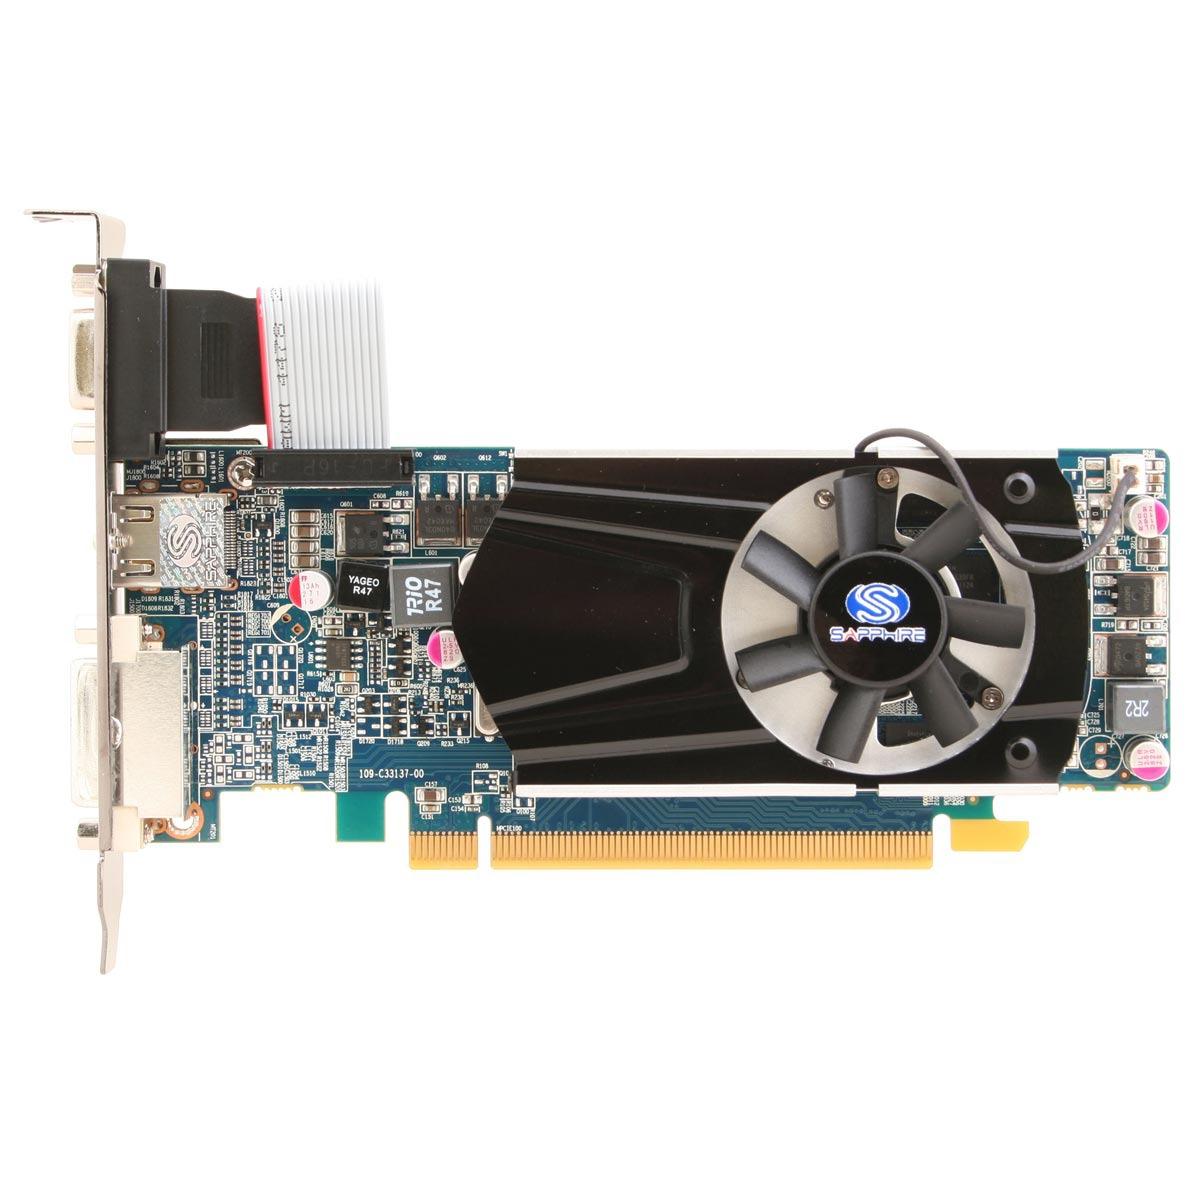 Carte graphique Sapphire Radeon HD 6570 1 GB DDR3 Sapphire Radeon HD 6570 1 Go - 1 Go HDMI/DVI - PCI Express (AMD Radeon HD 6570)